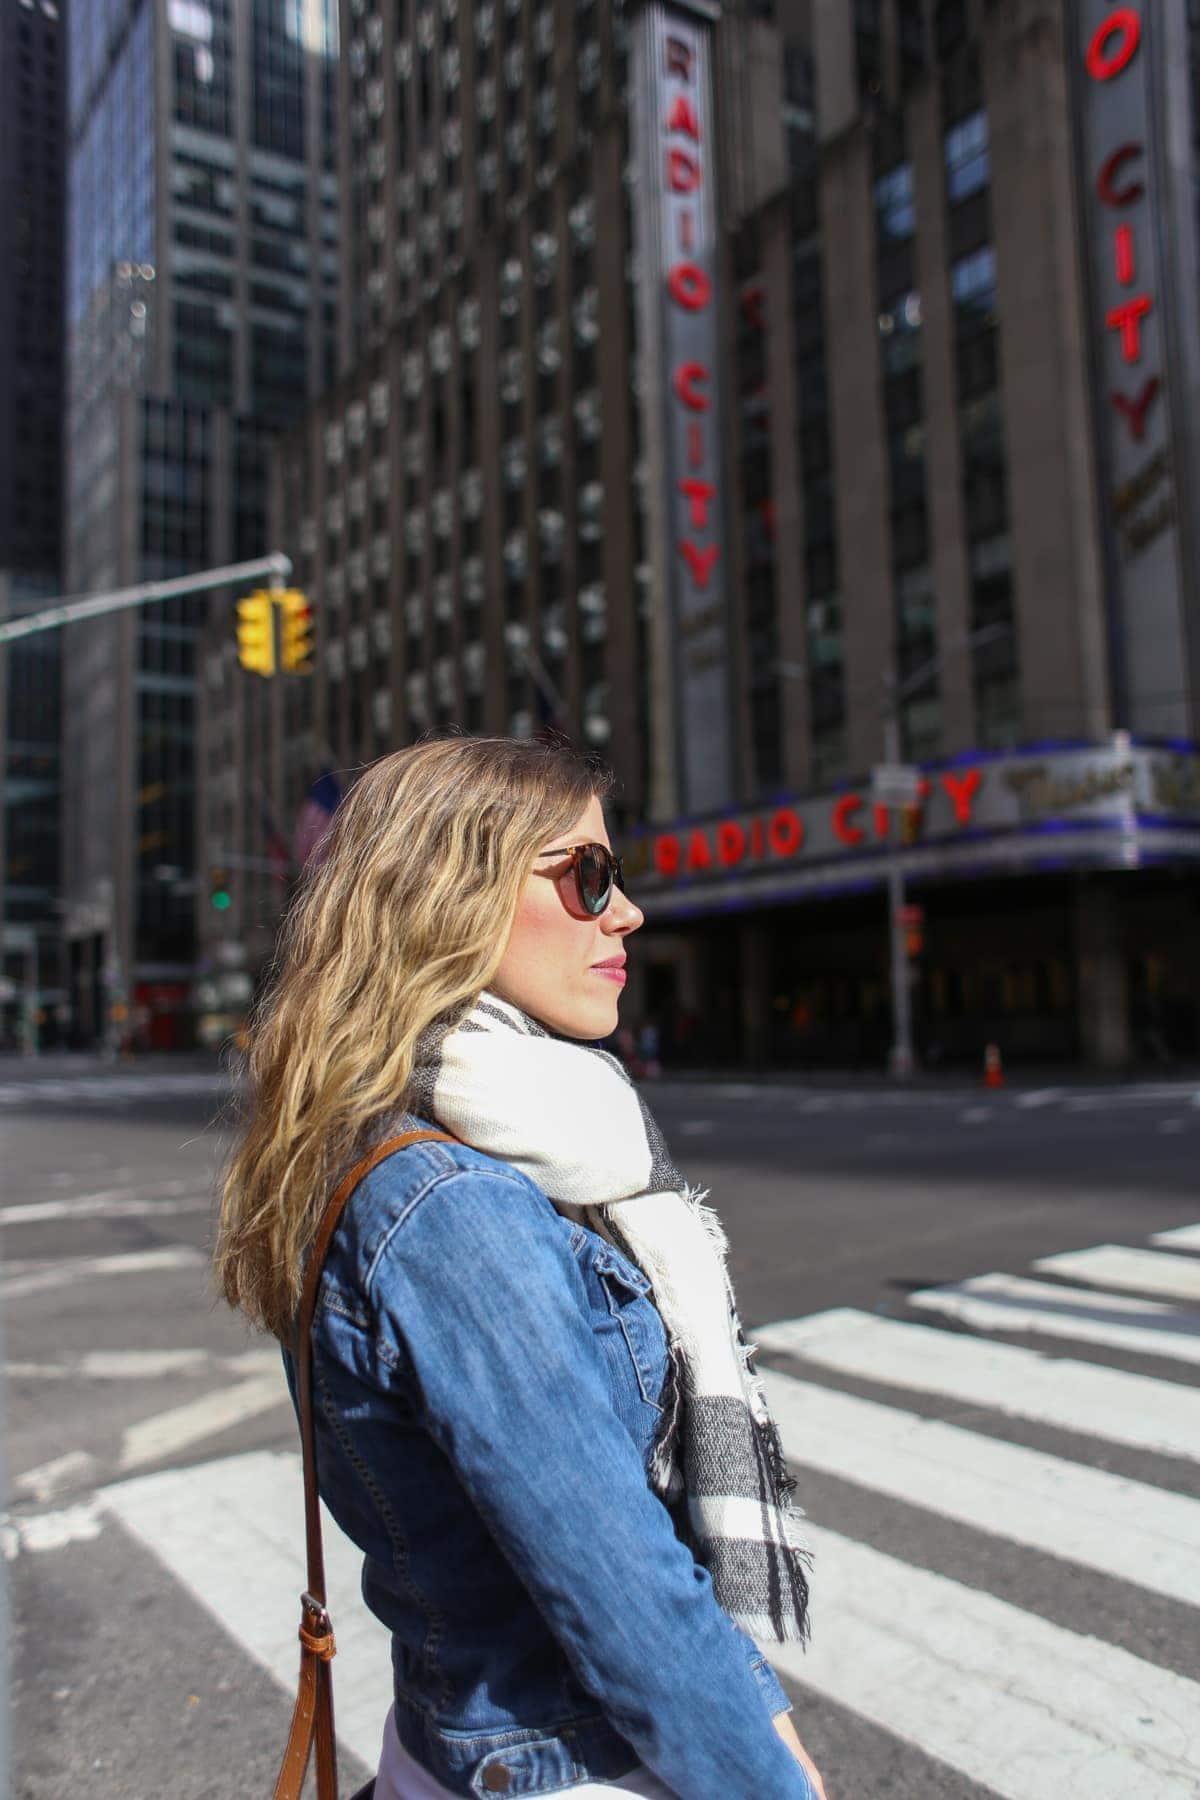 Lauren next to Radio City Music Hall